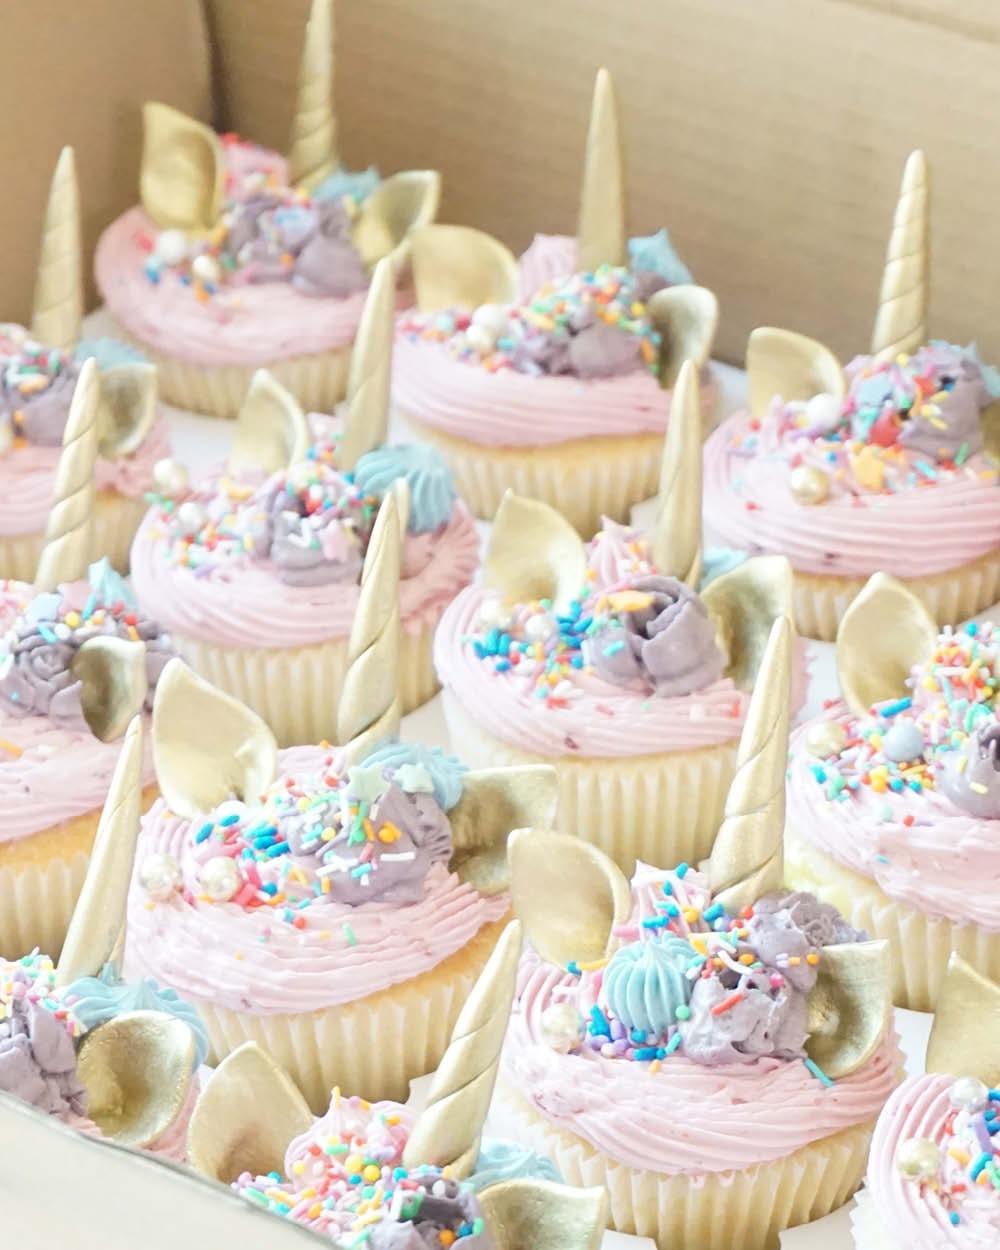 Cakes_By_Aranee_Perth_Drip_Cakes_Custom_Cakes_Wedding_Cakes_Macarons_Cupcakes_Personalised_Cookies_OTHER_DESSERTS_Gallery5.jpg